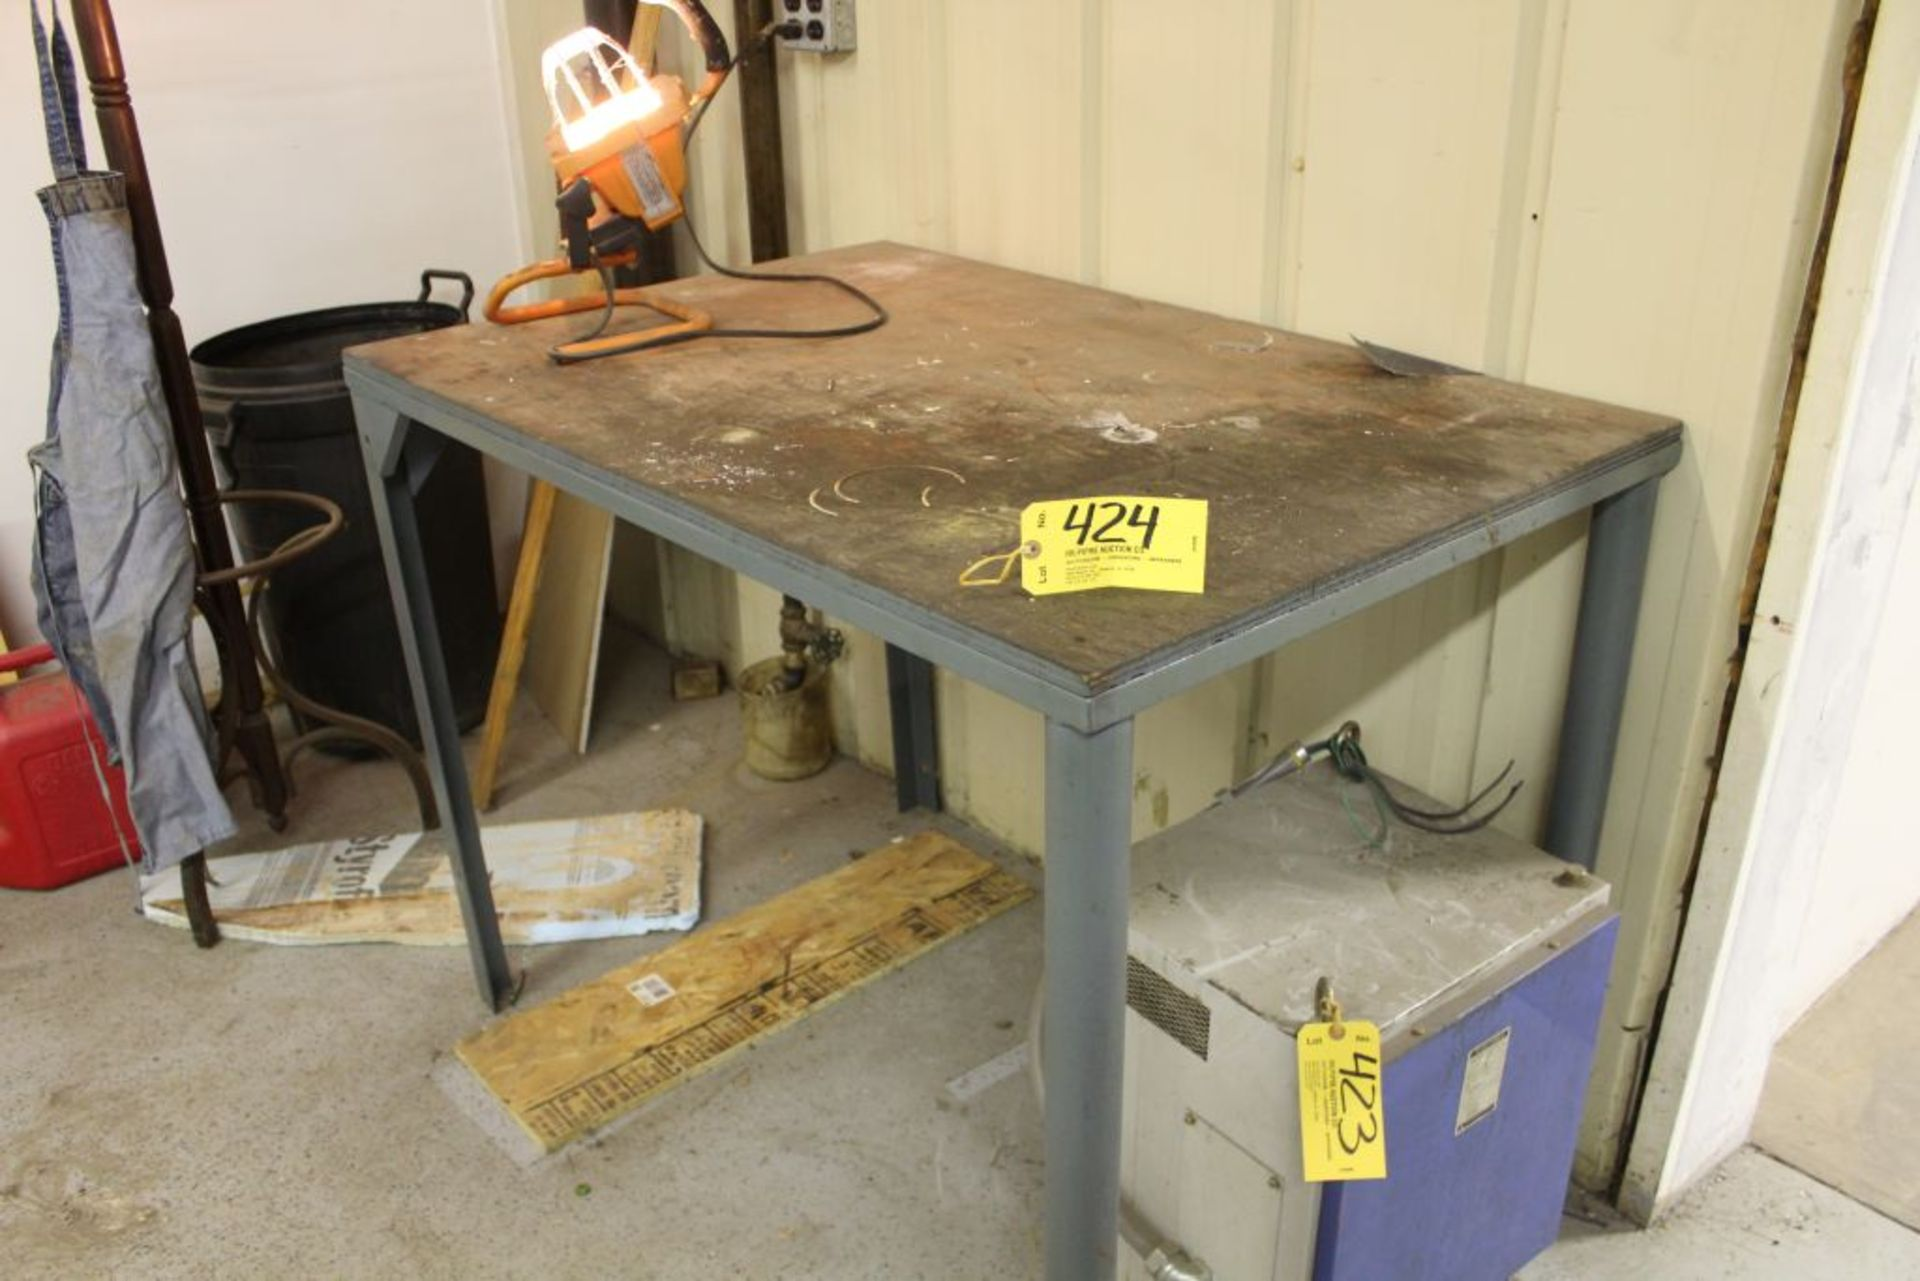 "Lot 424 - Steel fram, wood top bench, 49""x33""x38""."